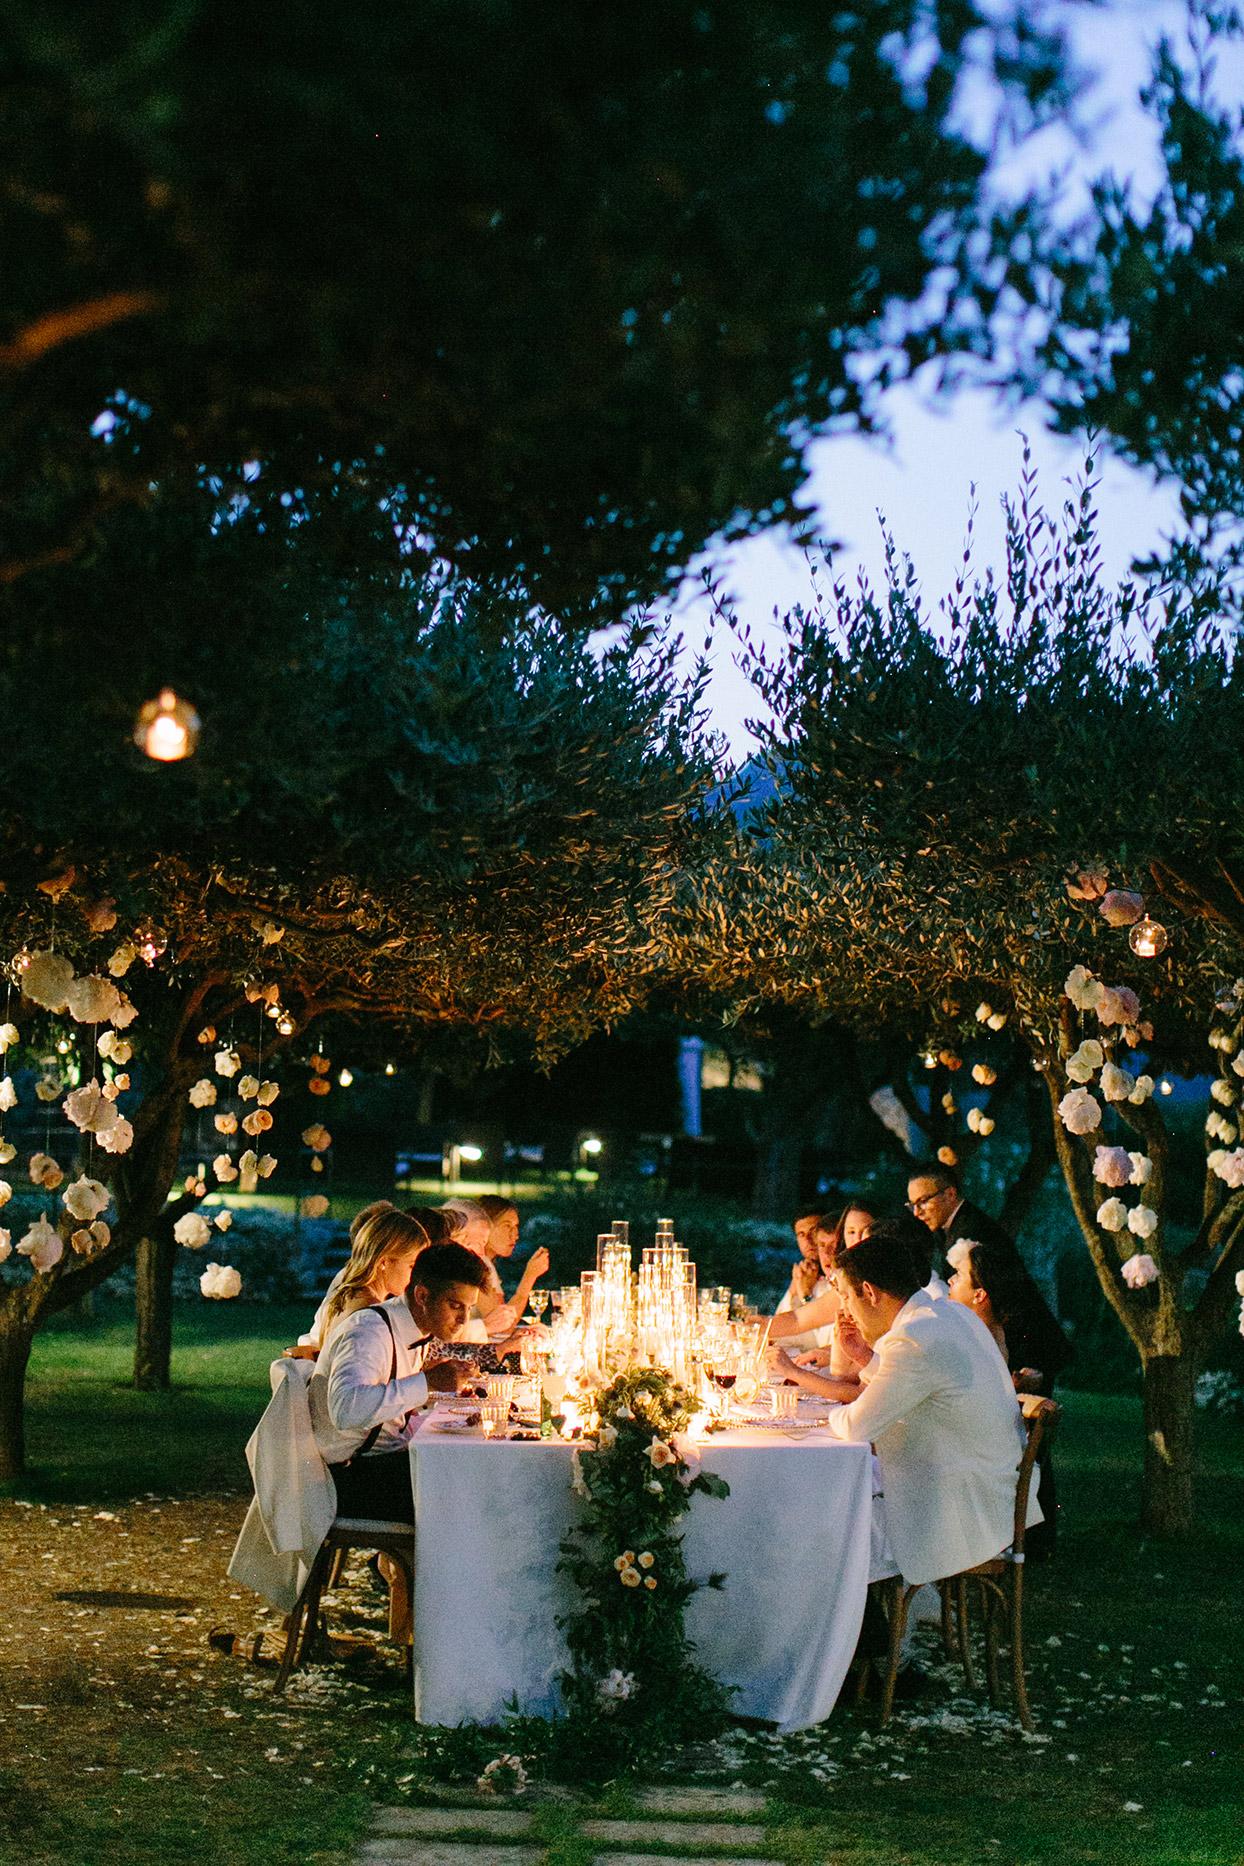 jacqueline david wedding intimate candle lit dinner